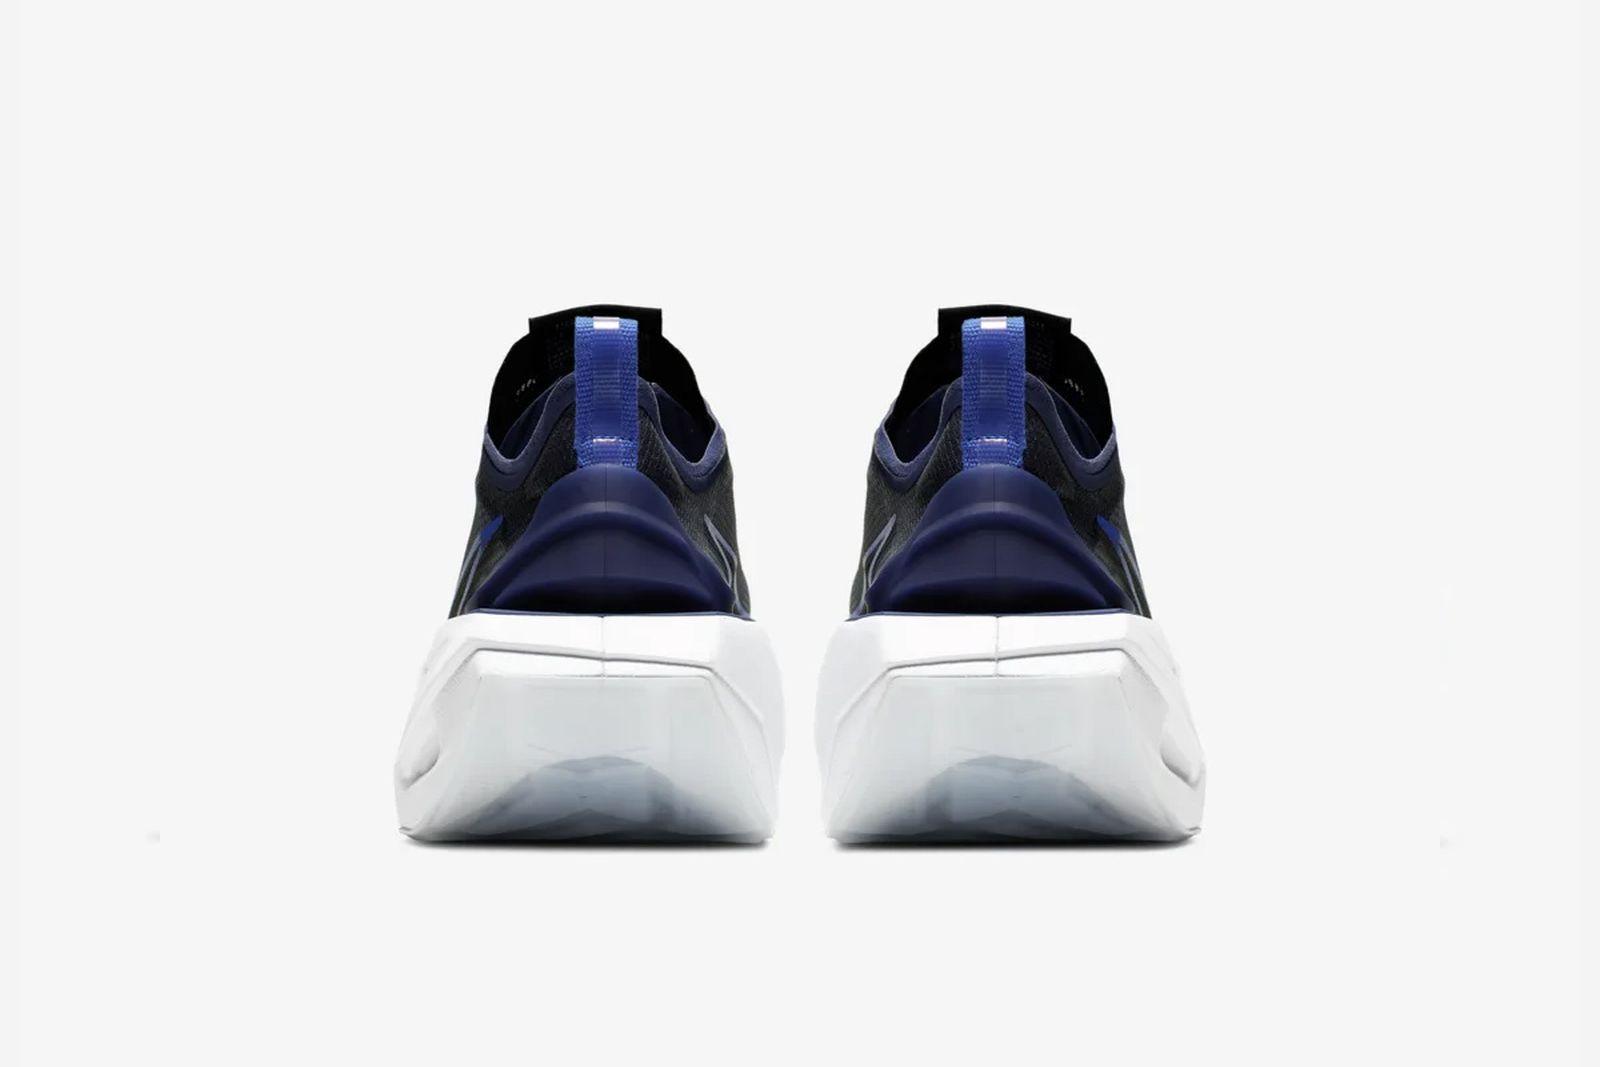 nike zoom x vista grind racer blue release date price